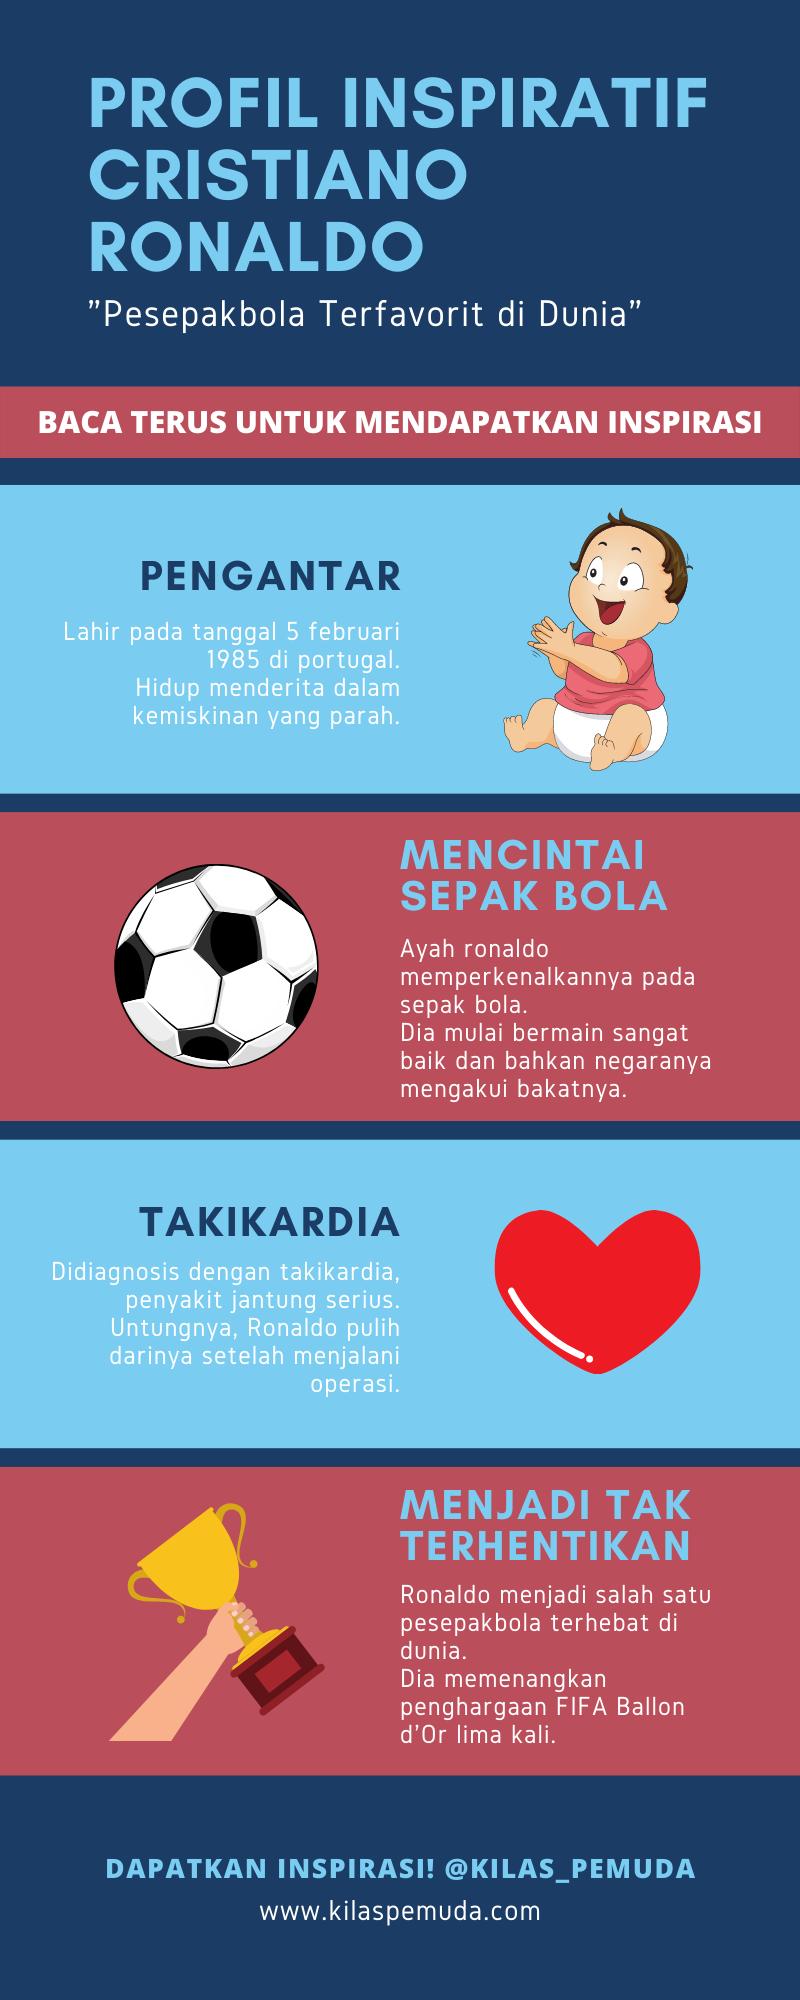 Infografis profil inspiratif Cristiano Ronaldo